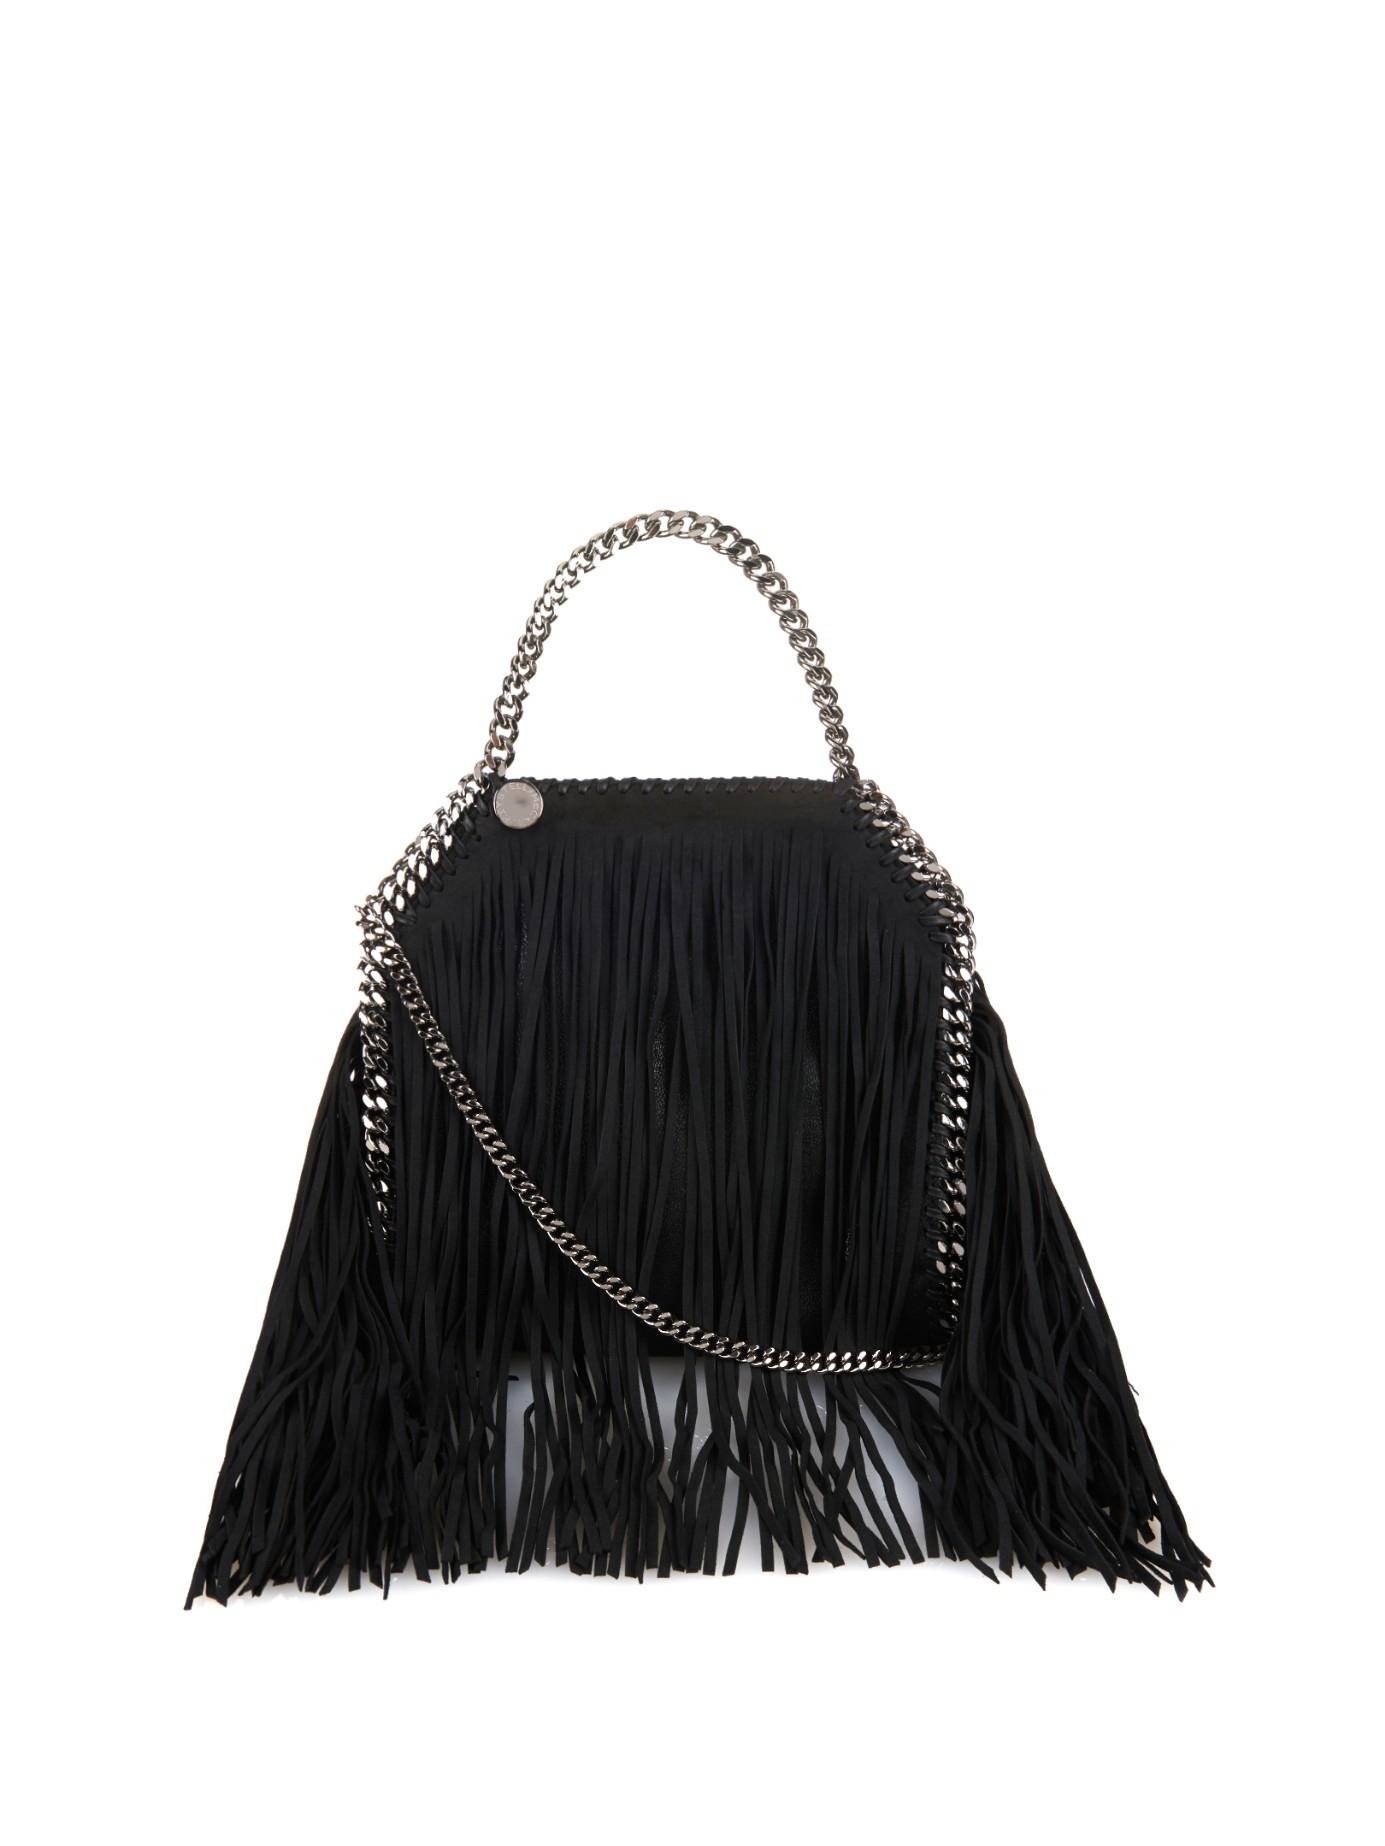 Stella McCartney Falabella Fringed Faux-suede Cross-body Bag in Black